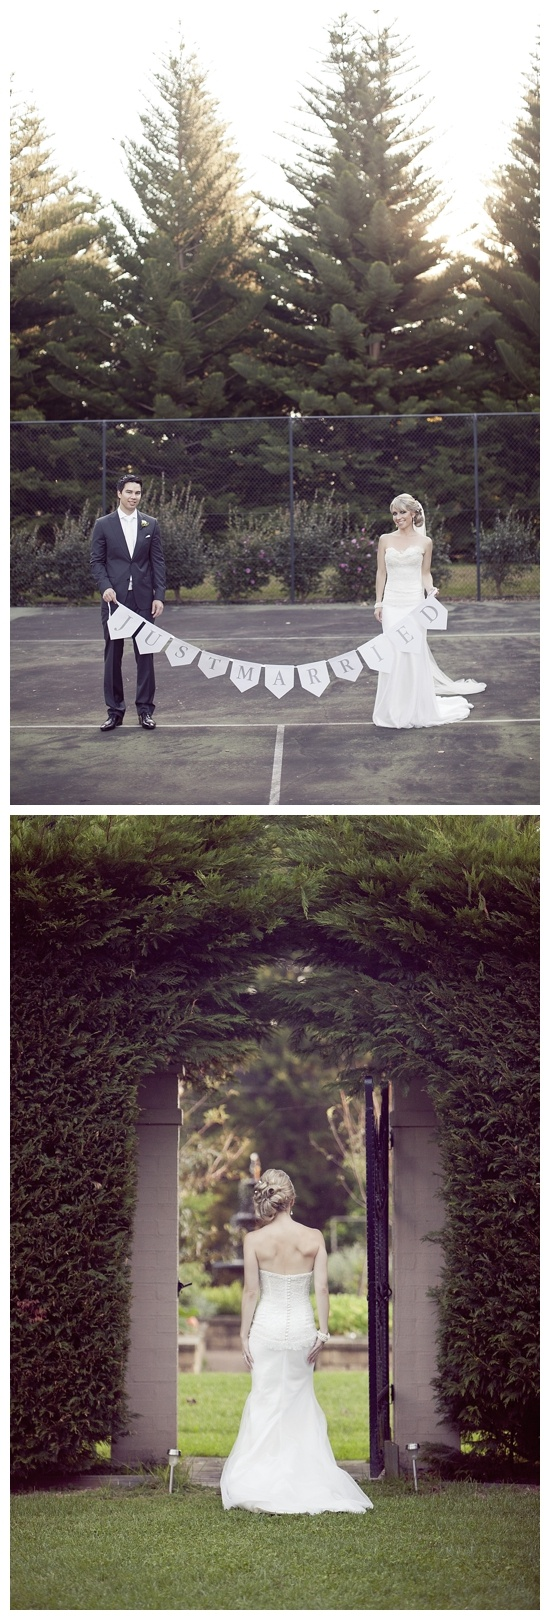 dress terrara house estate wedding photographer berry wedding photographer